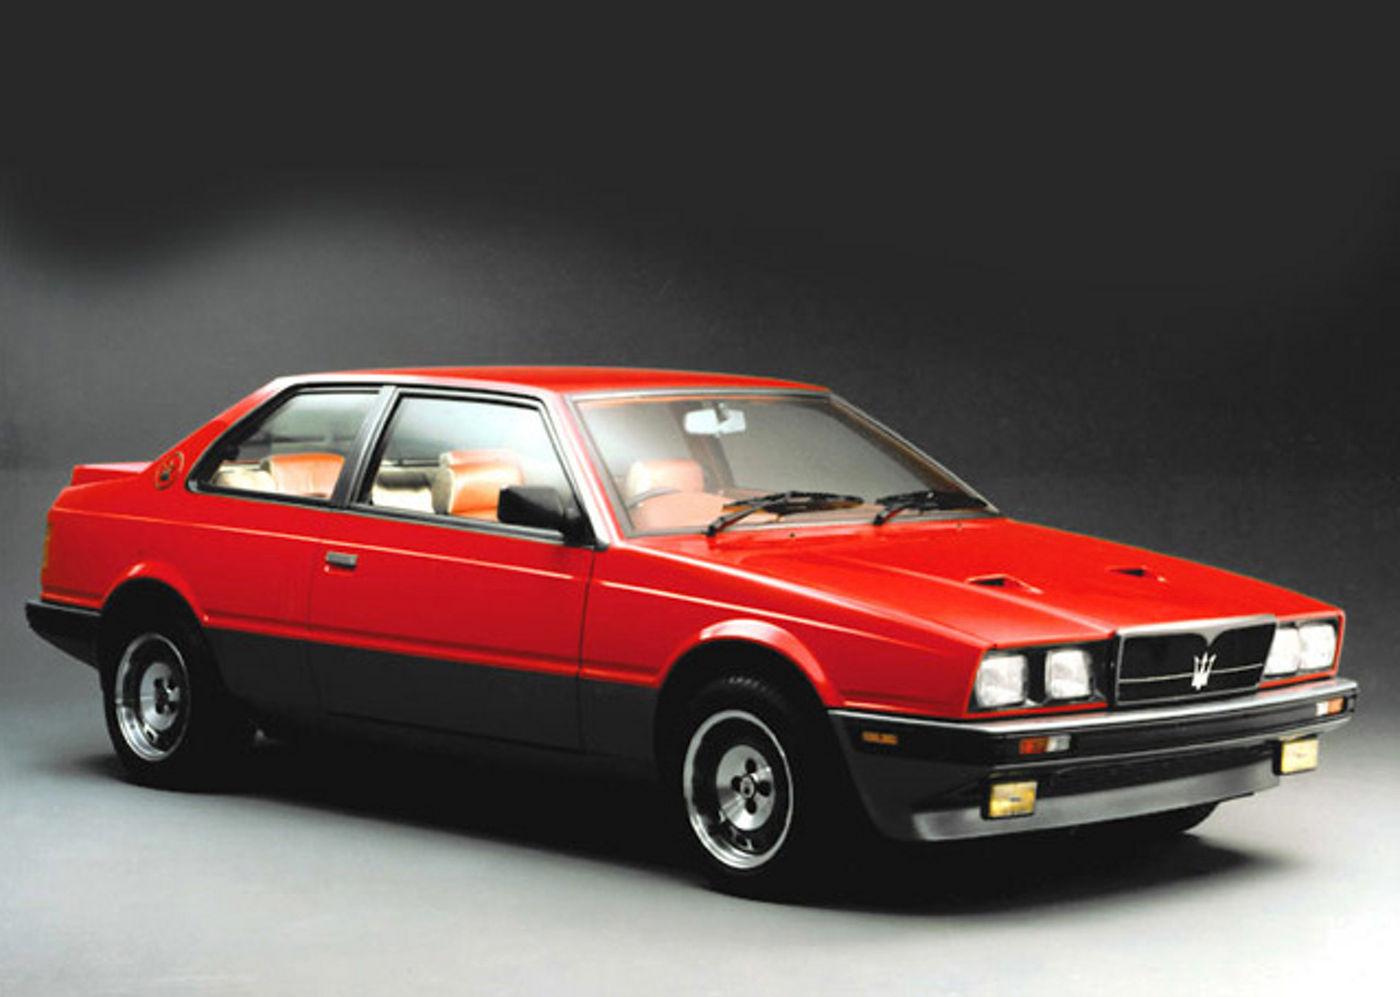 1983 Maserati Biturbo Export - 2.5liter version of the classic car model